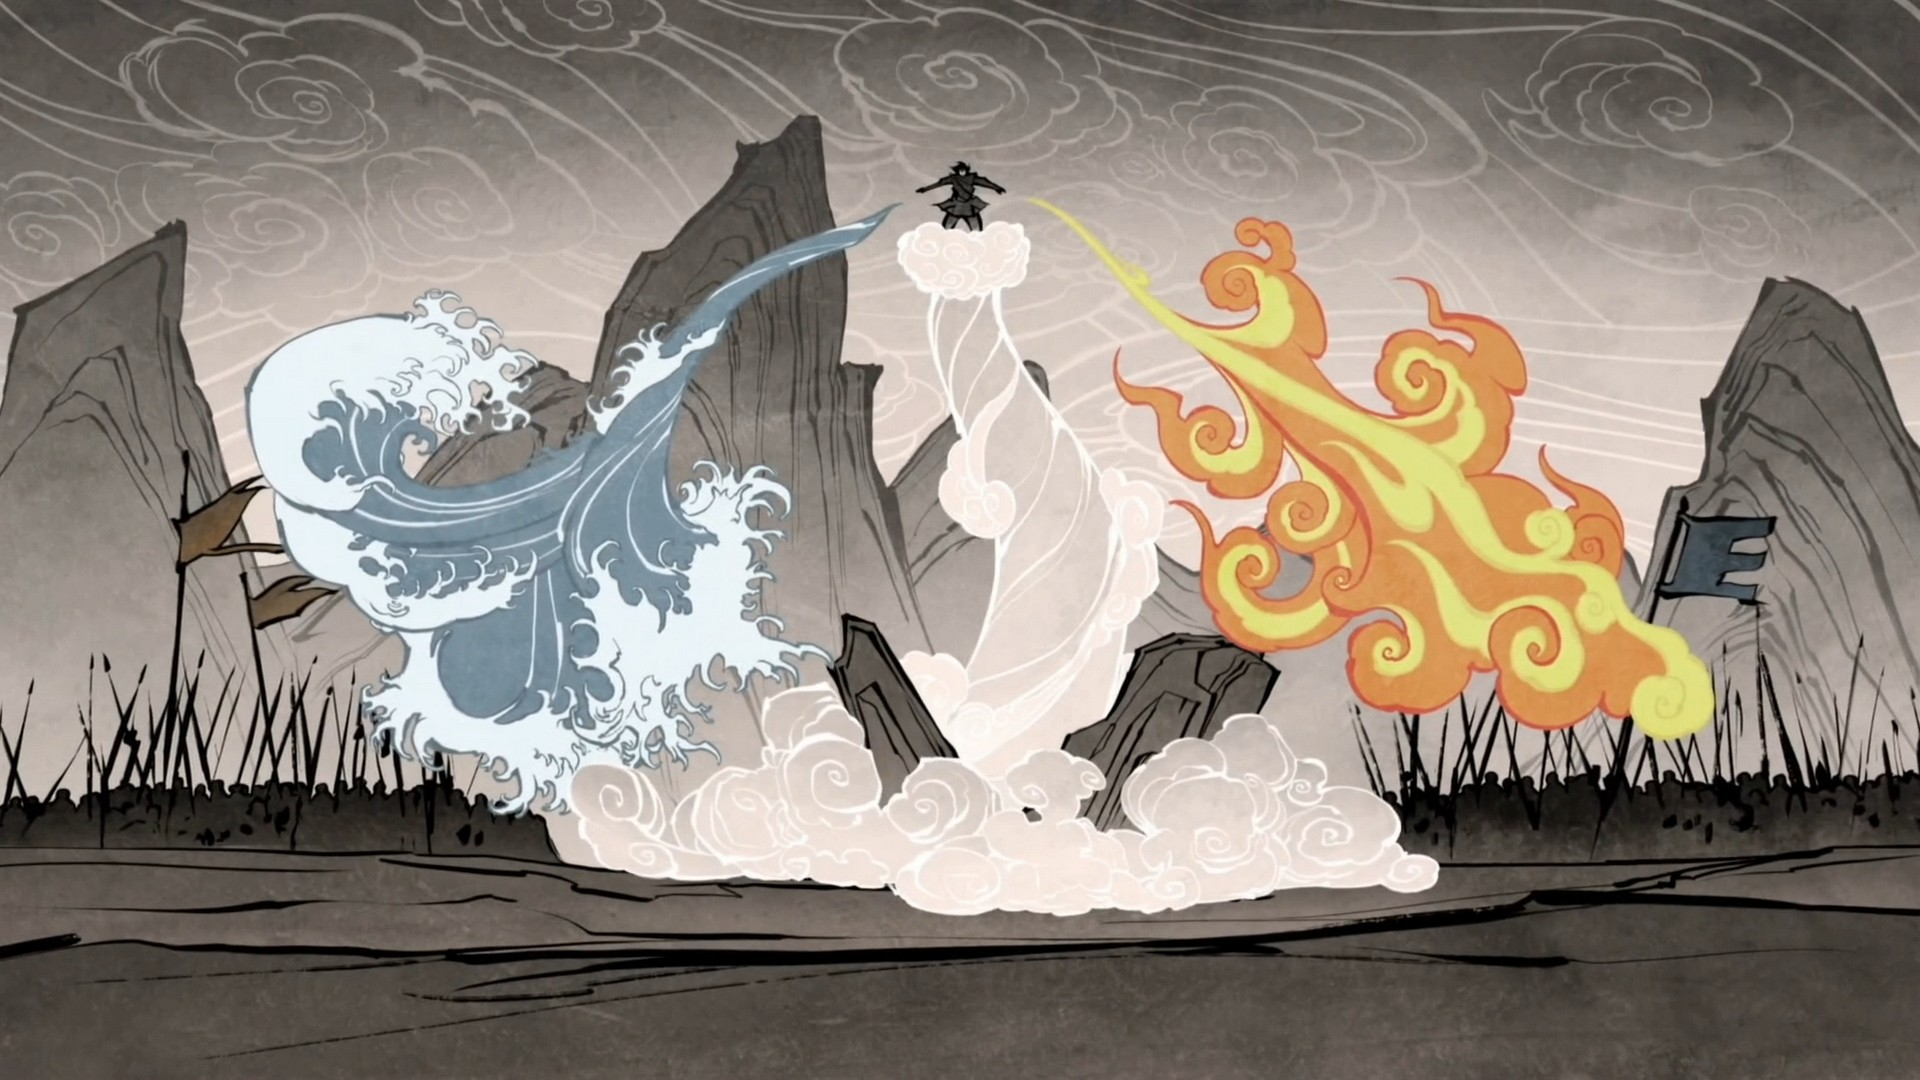 Wallpaper Avatar: the last Airbender cartoon series